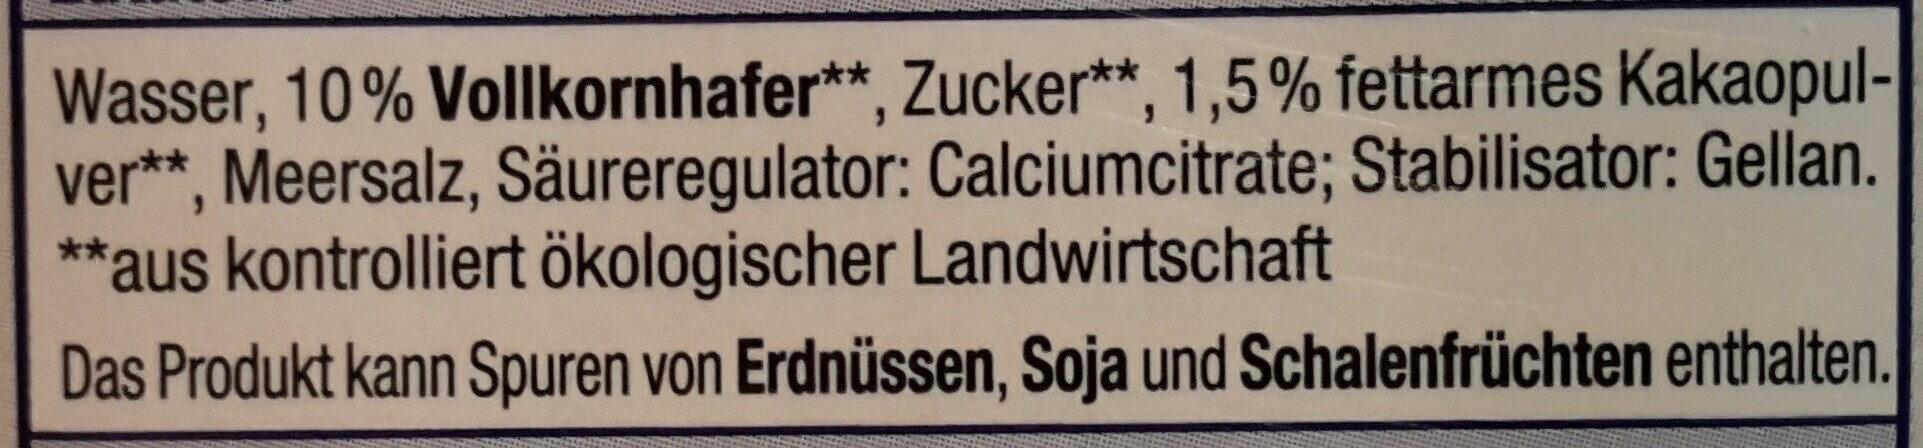 Hafer Drink Schoko - Ingredients - en